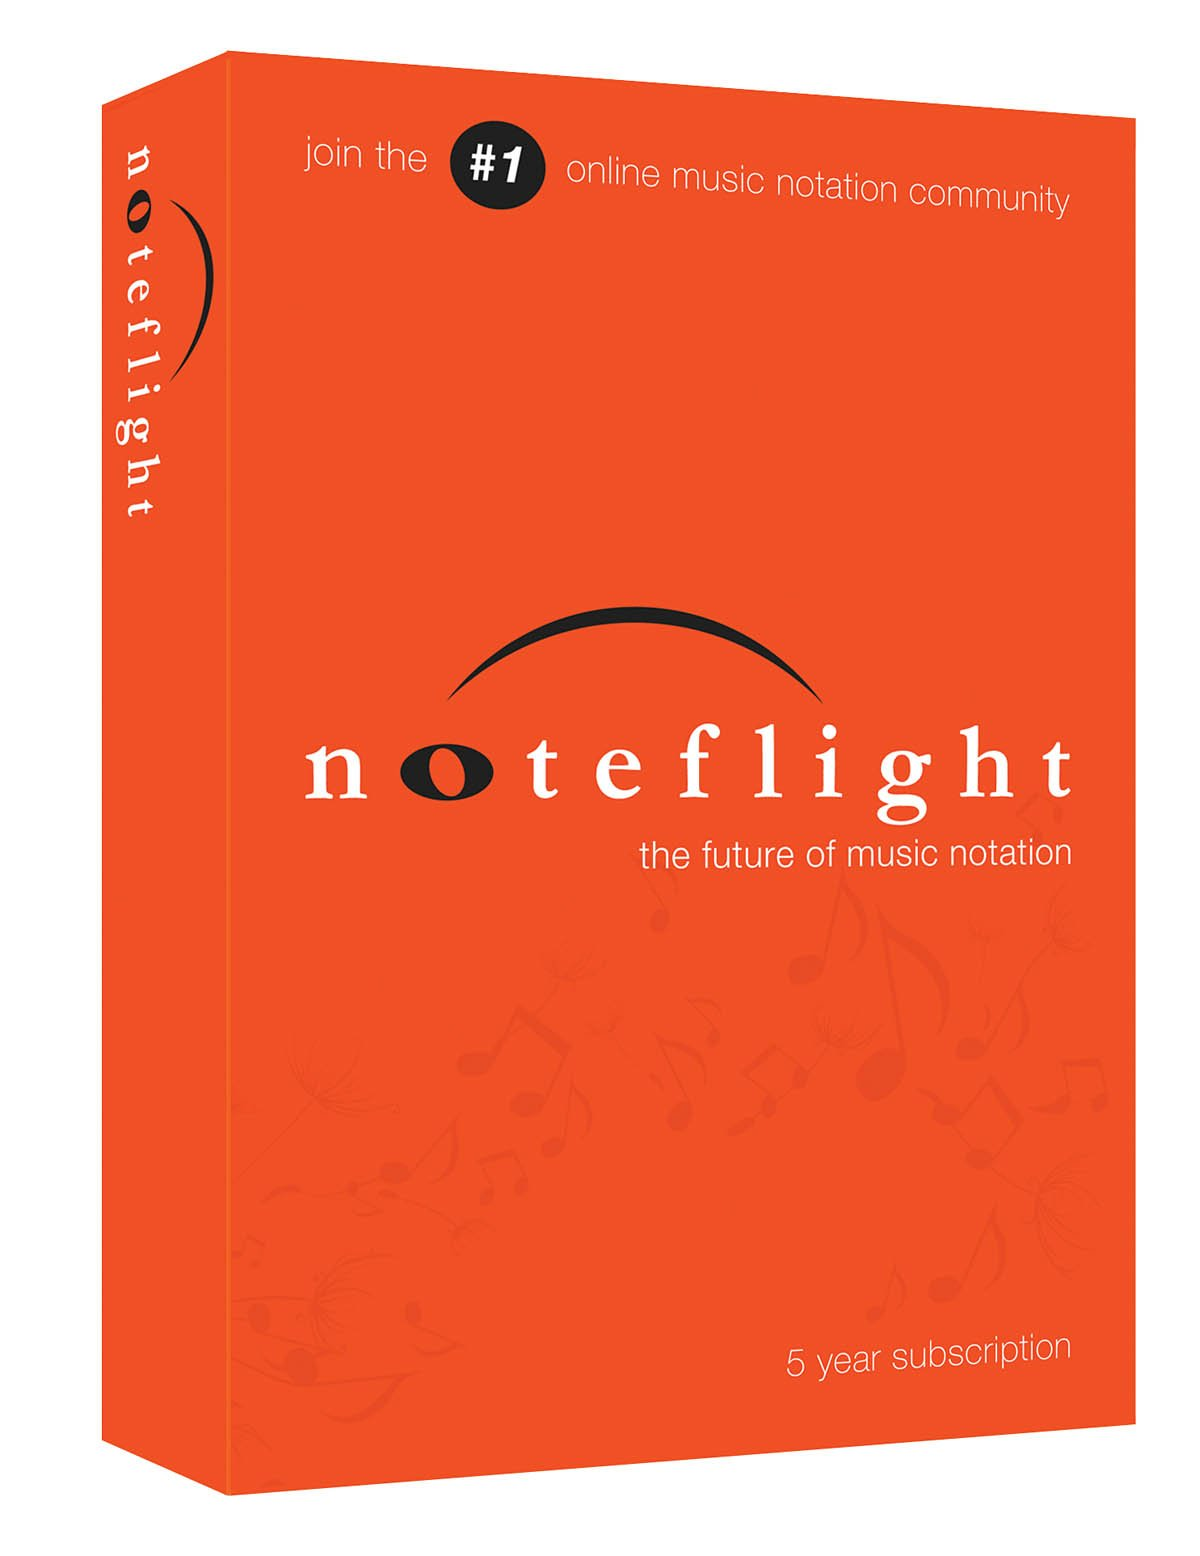 Noteflight 5 Year Subscription Retail Box